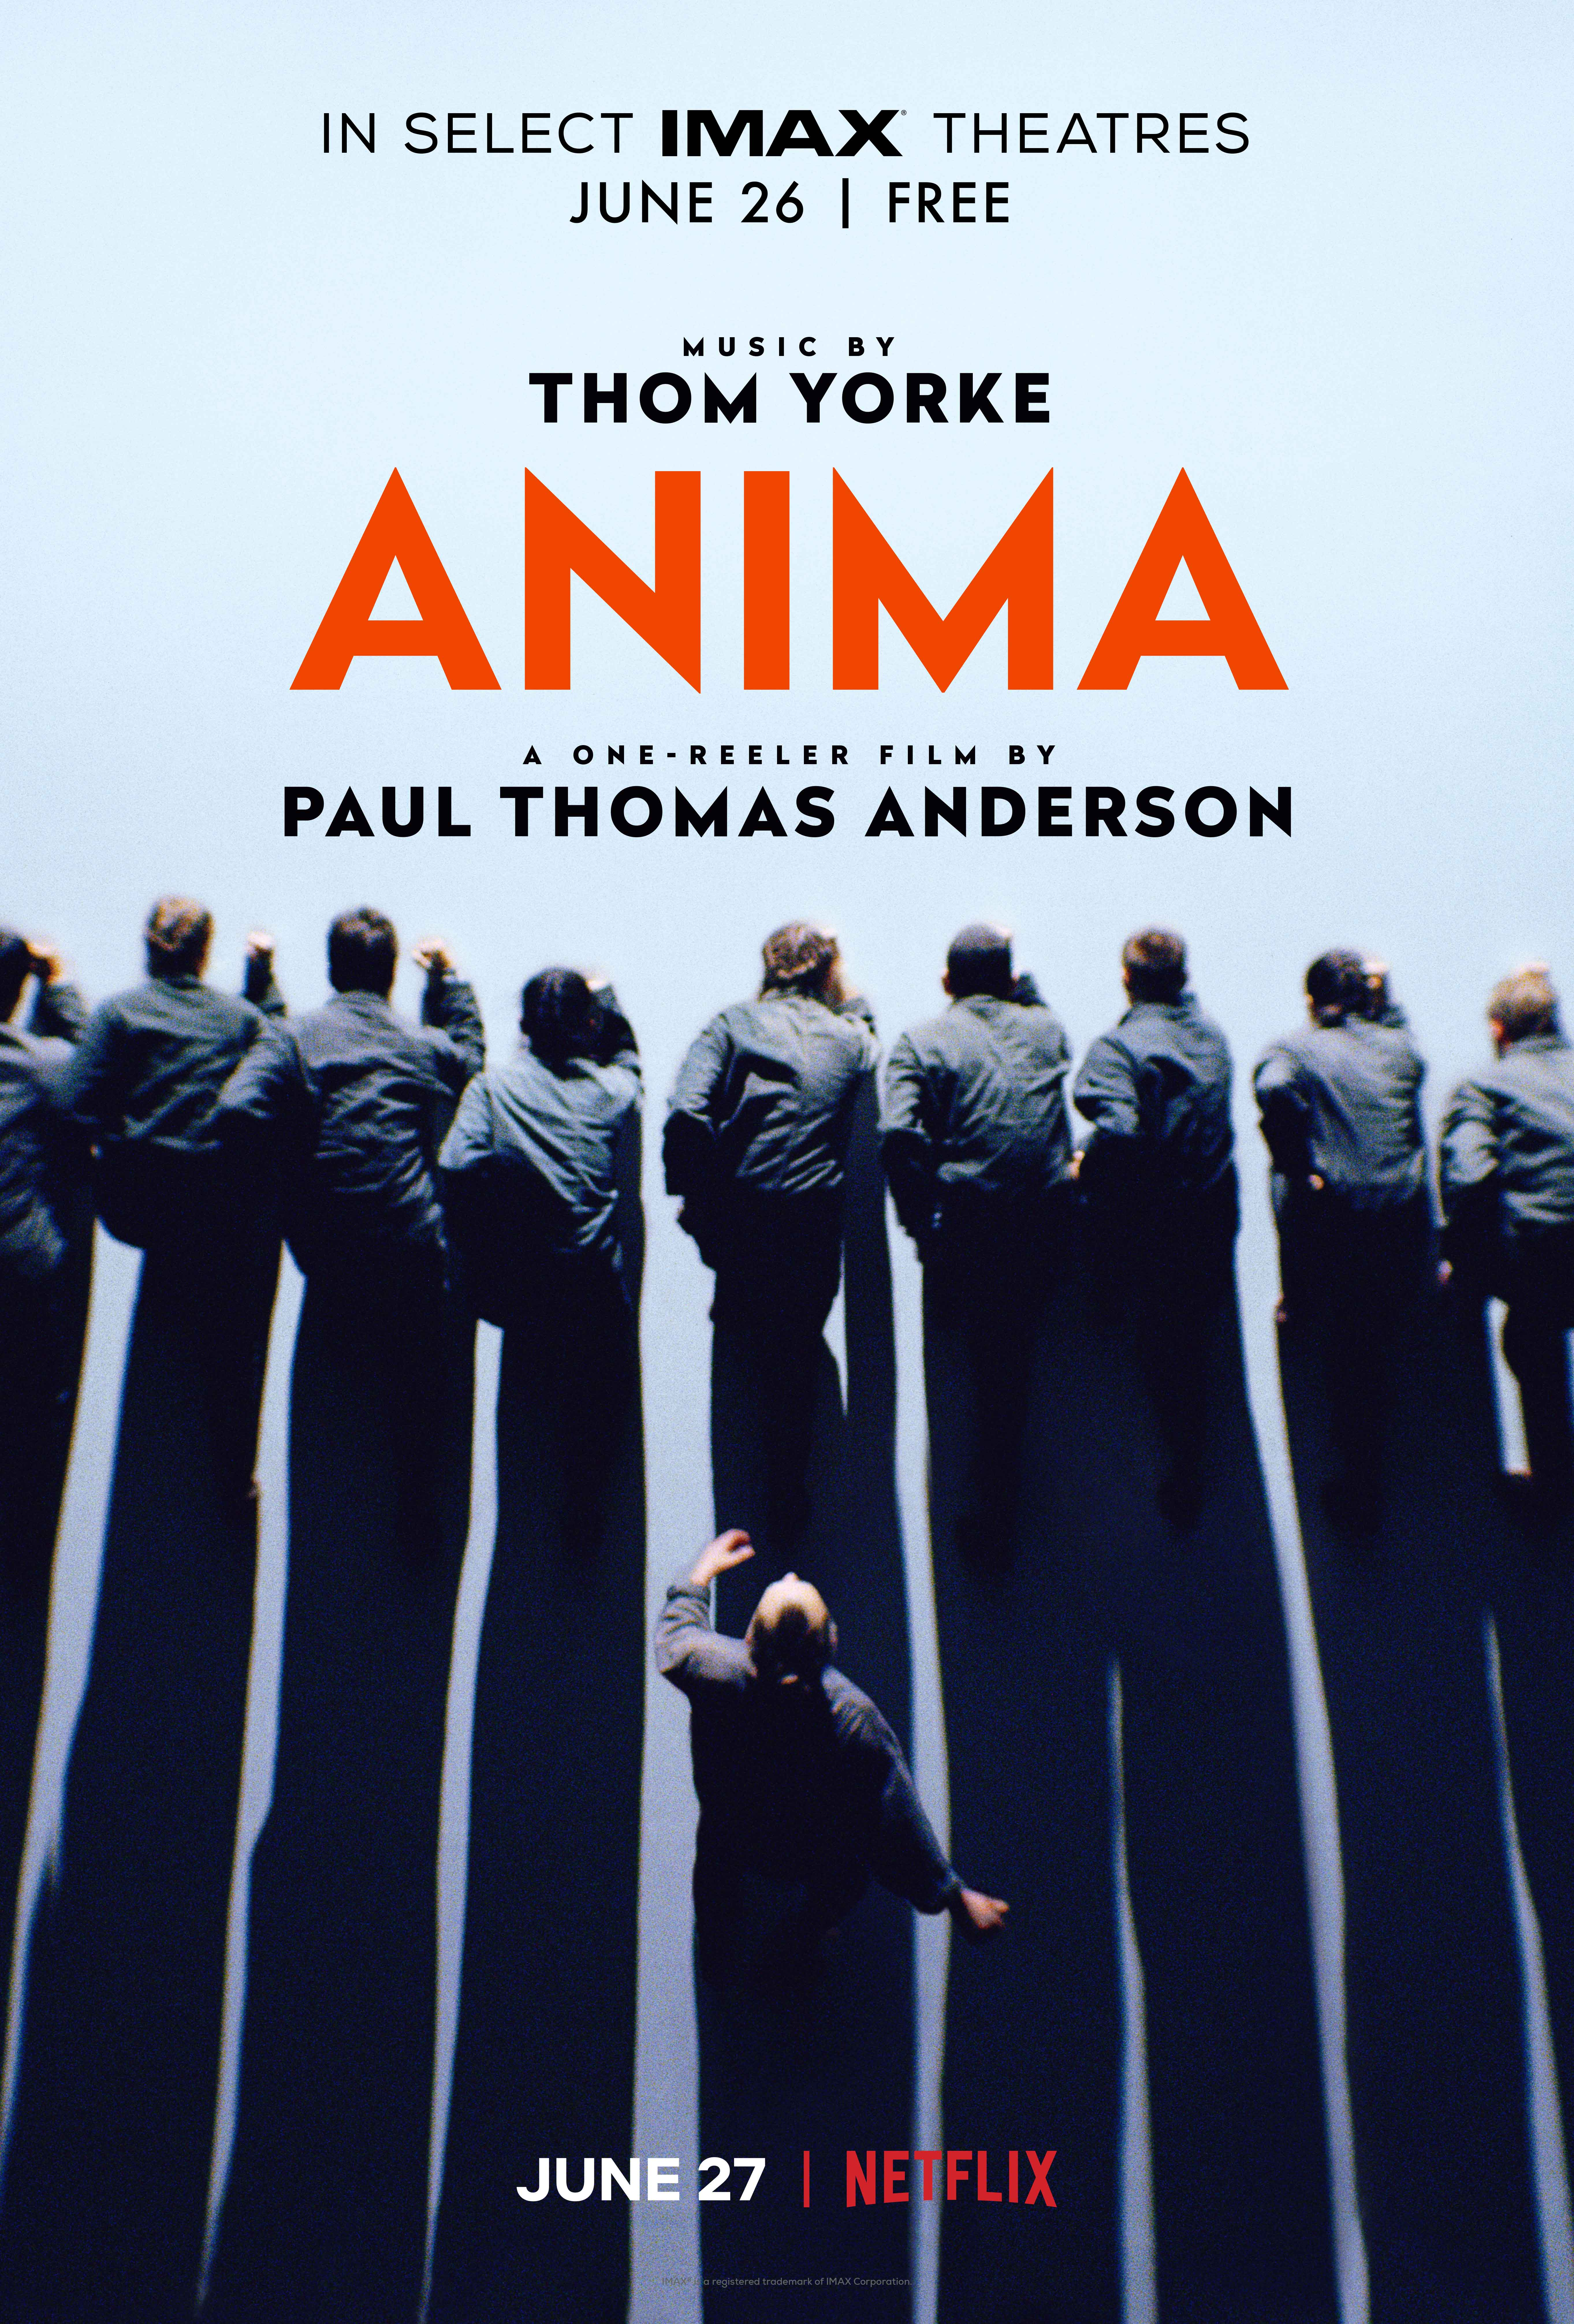 Thom Yorke - Anima Poster